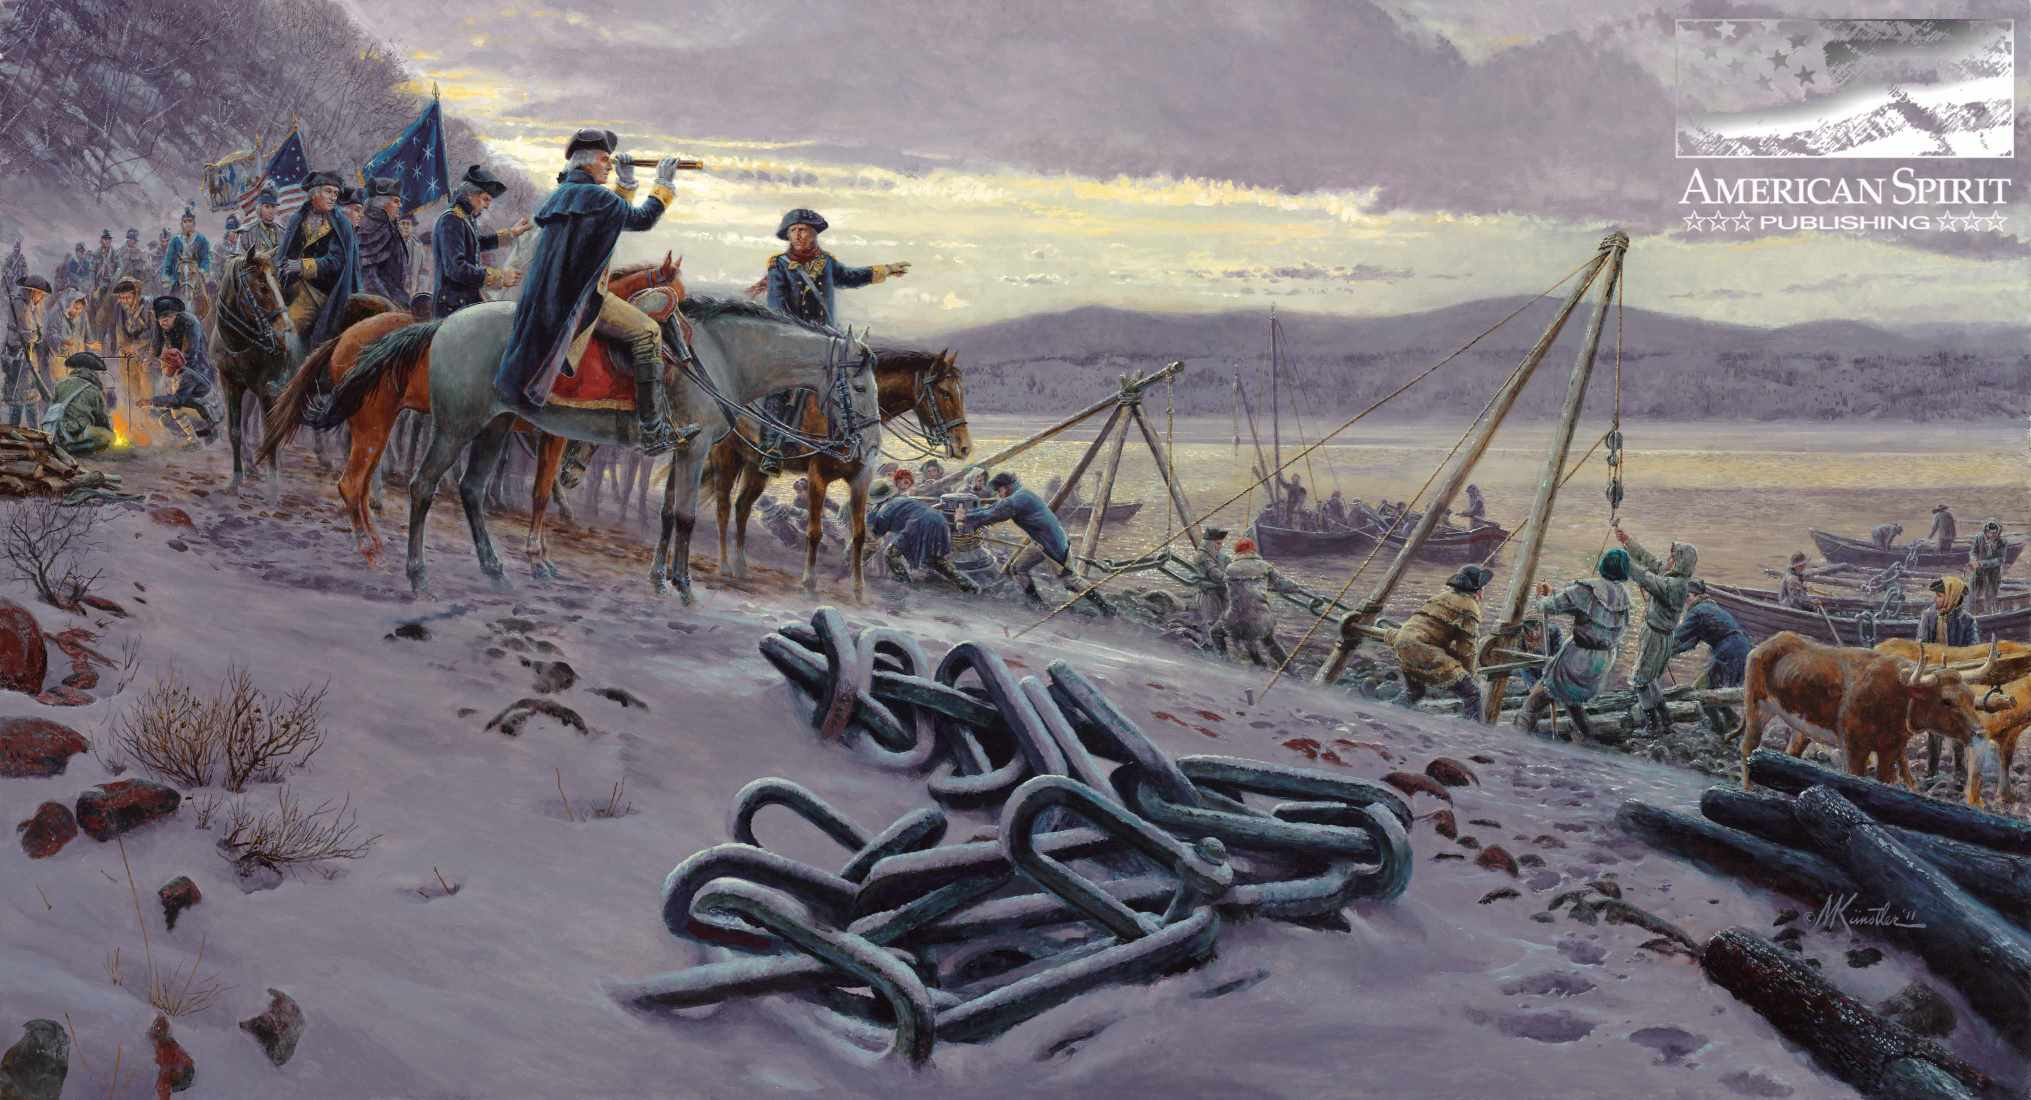 Washington's Watch Chain by Mort Kunstler